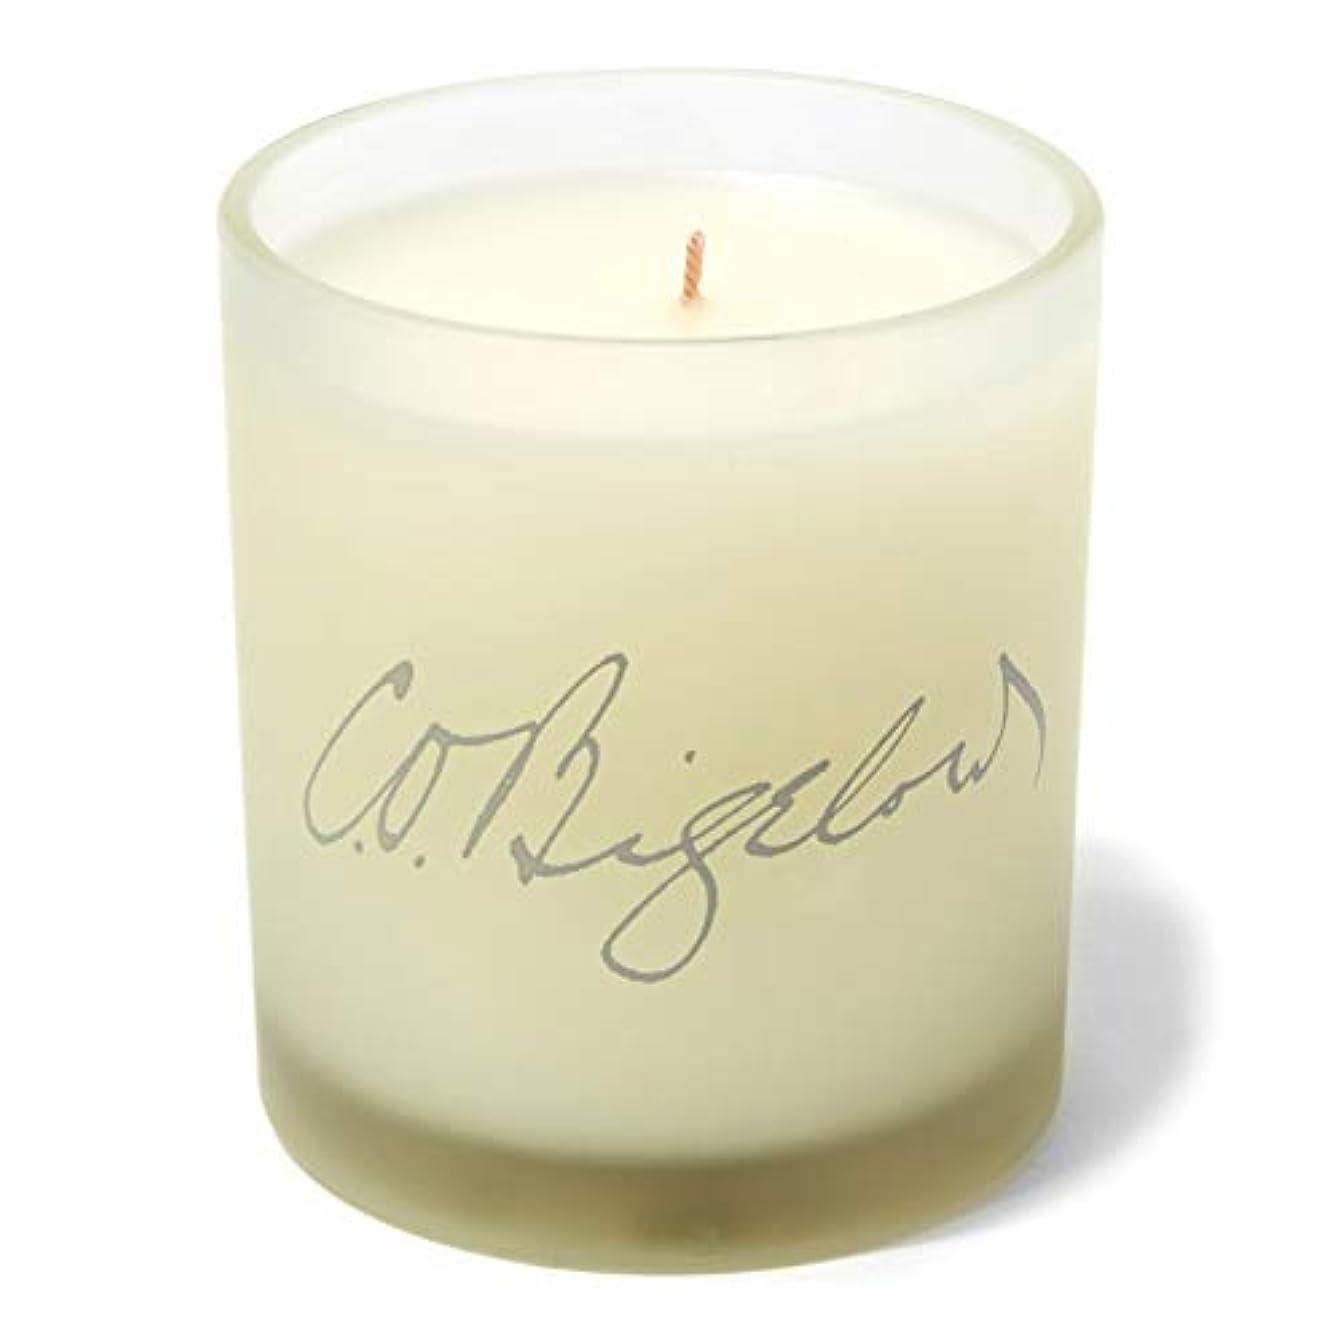 [C.O. Bigelow] C.O.ビゲローユーカリキャンドル241ミリリットル - C.O. Bigelow Eucalyptus Candle 241ml [並行輸入品]